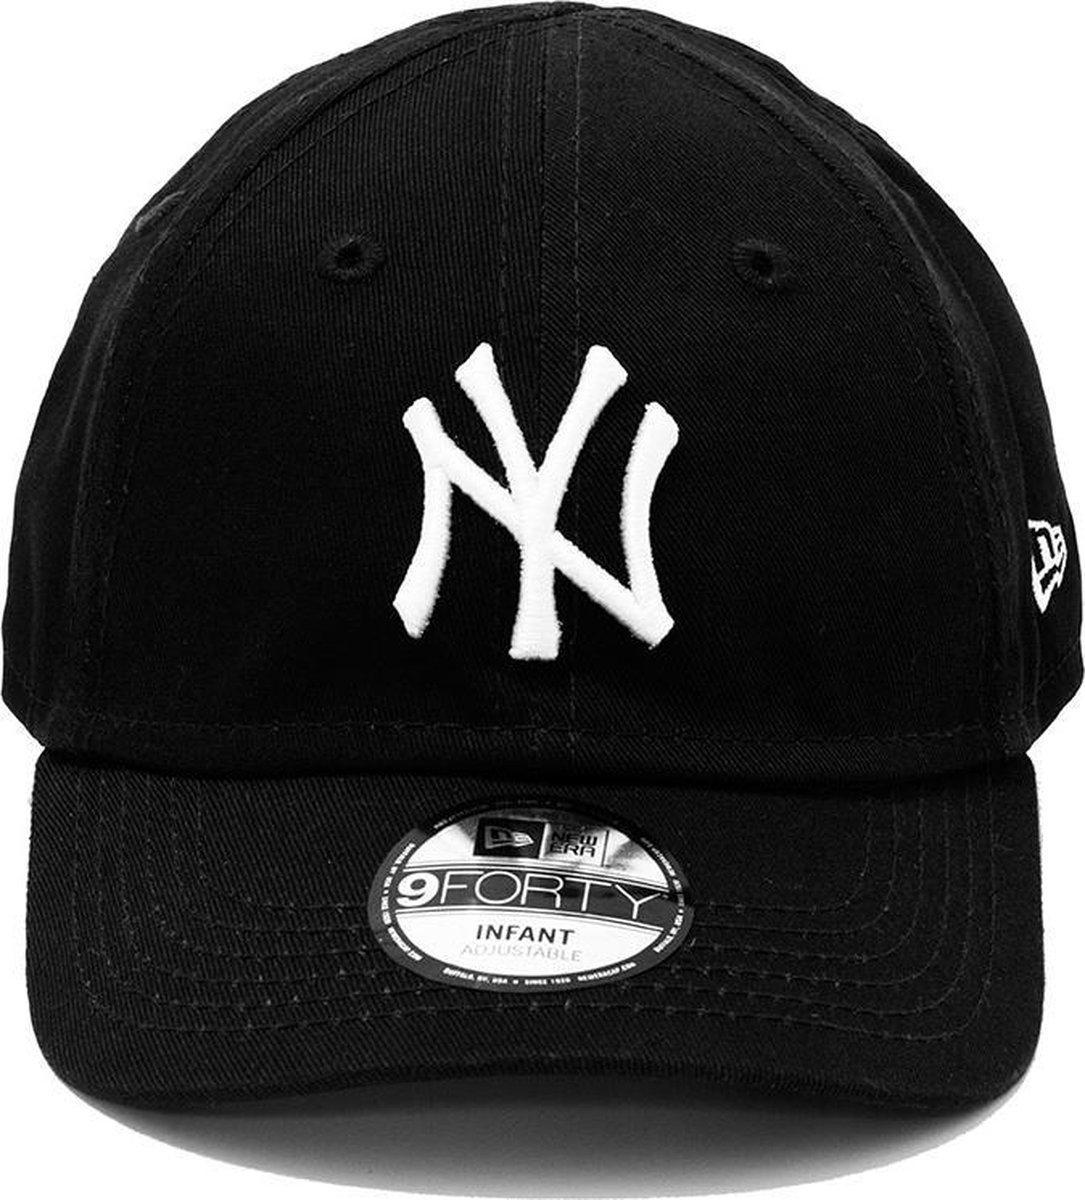 New Era LEAGUE ESSENTIAL INF 940 New York Yankees Cap - Black - 0-2 jaar